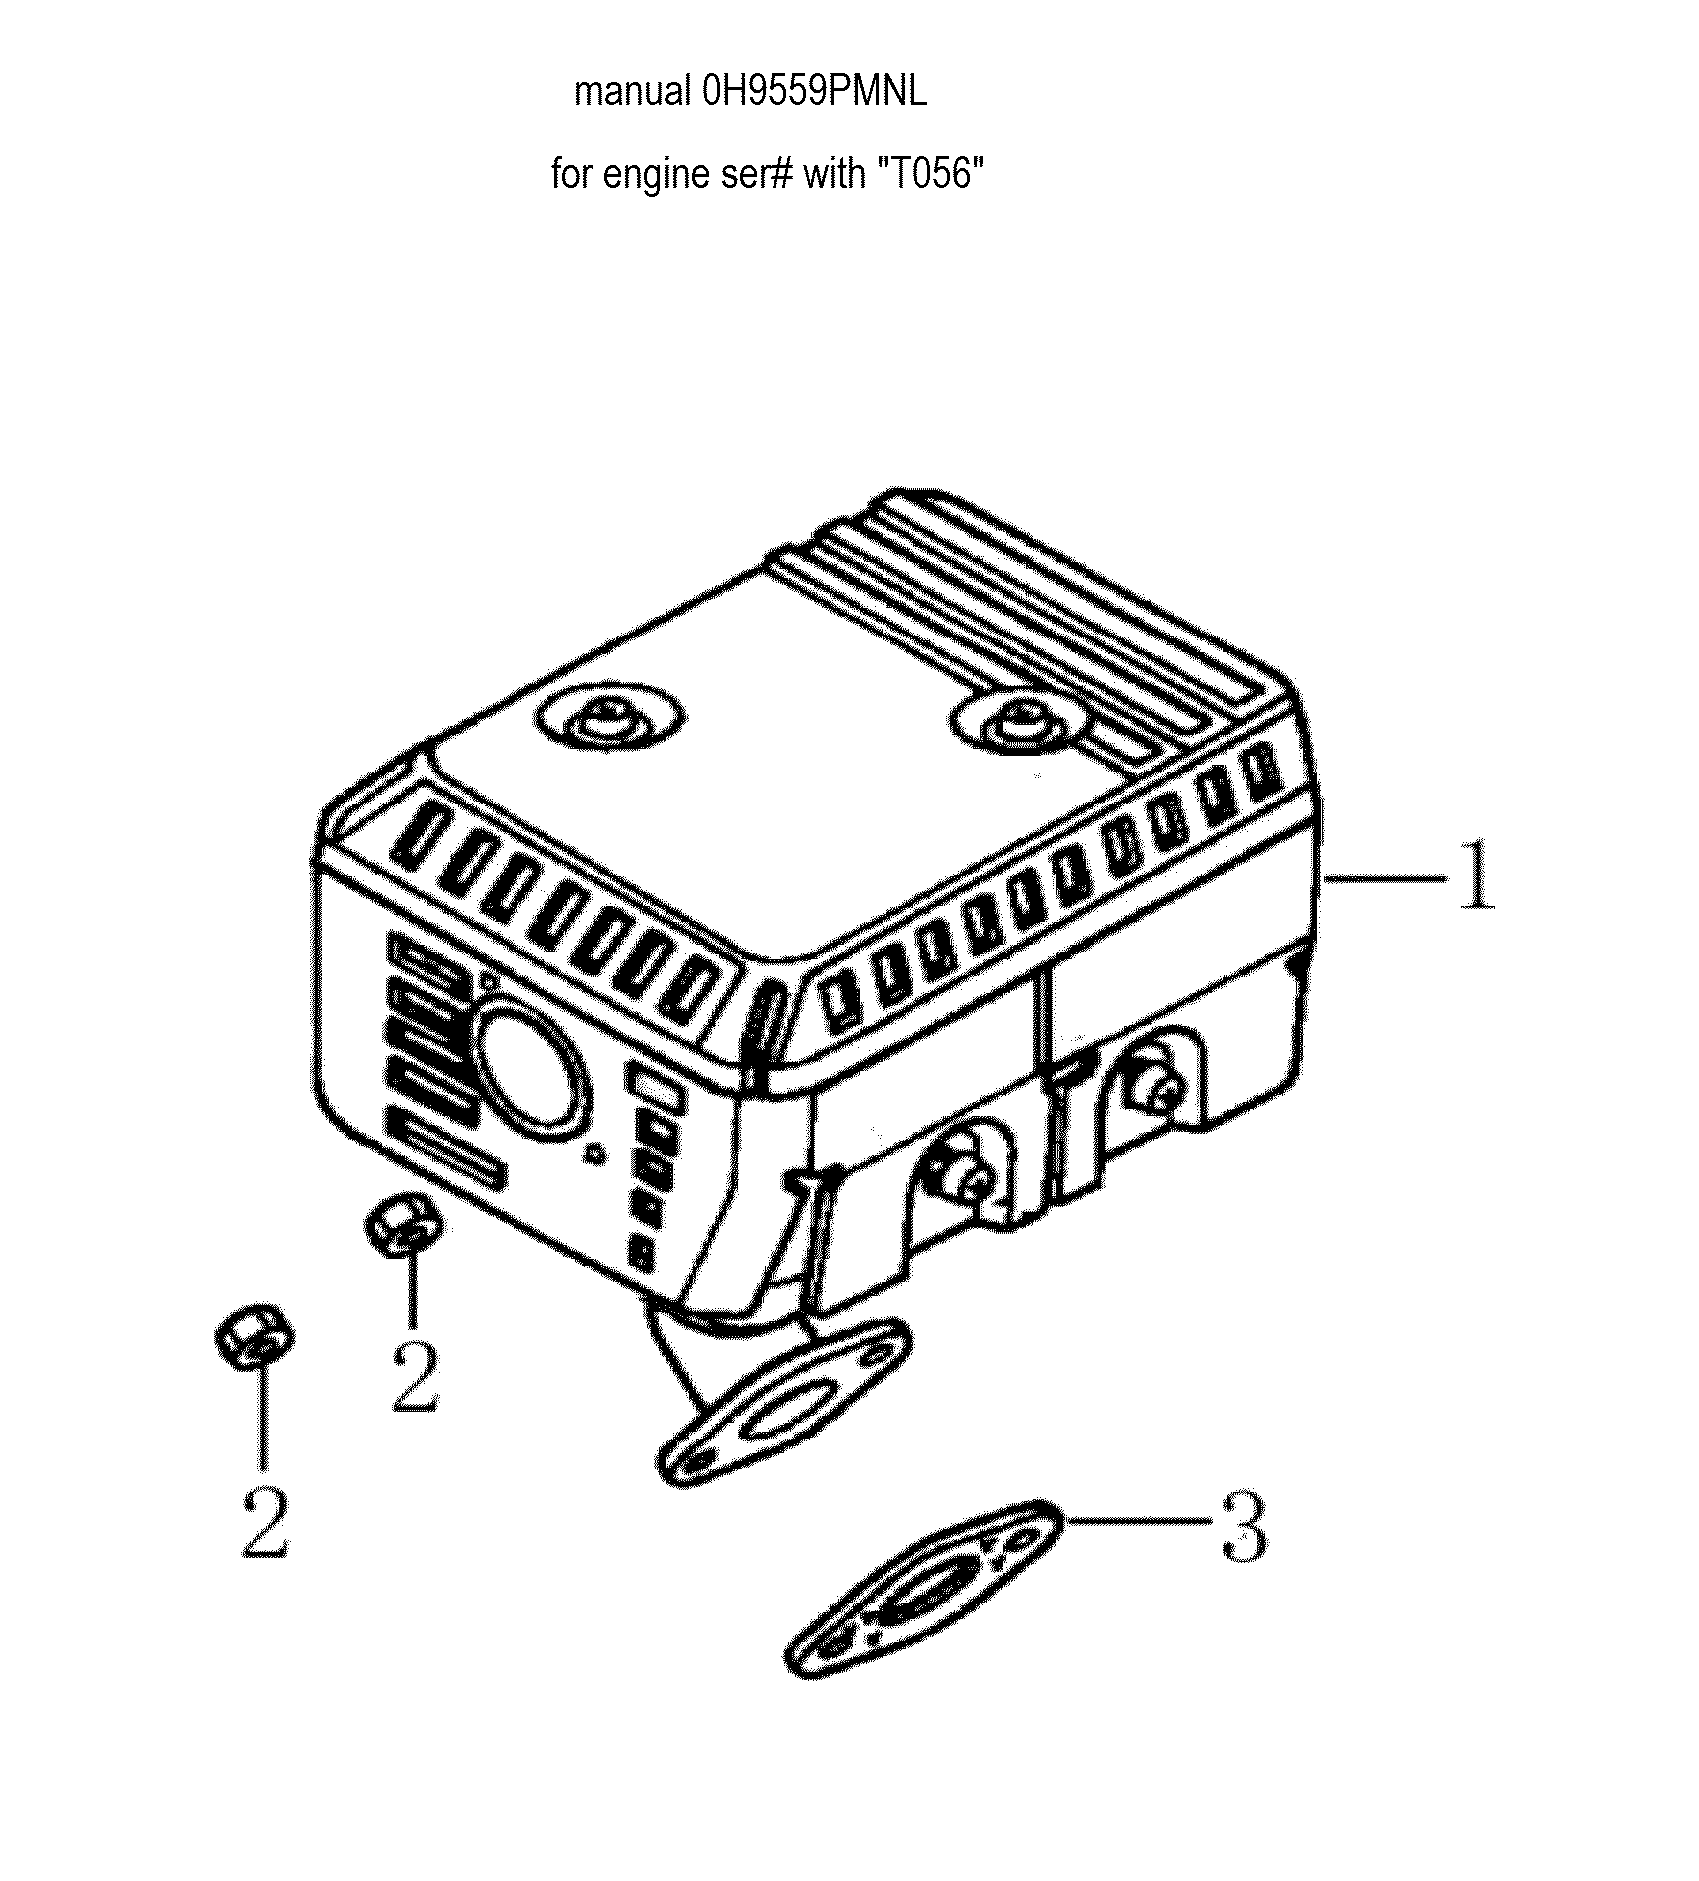 Generac model 006022-0 power washer, gas genuine parts